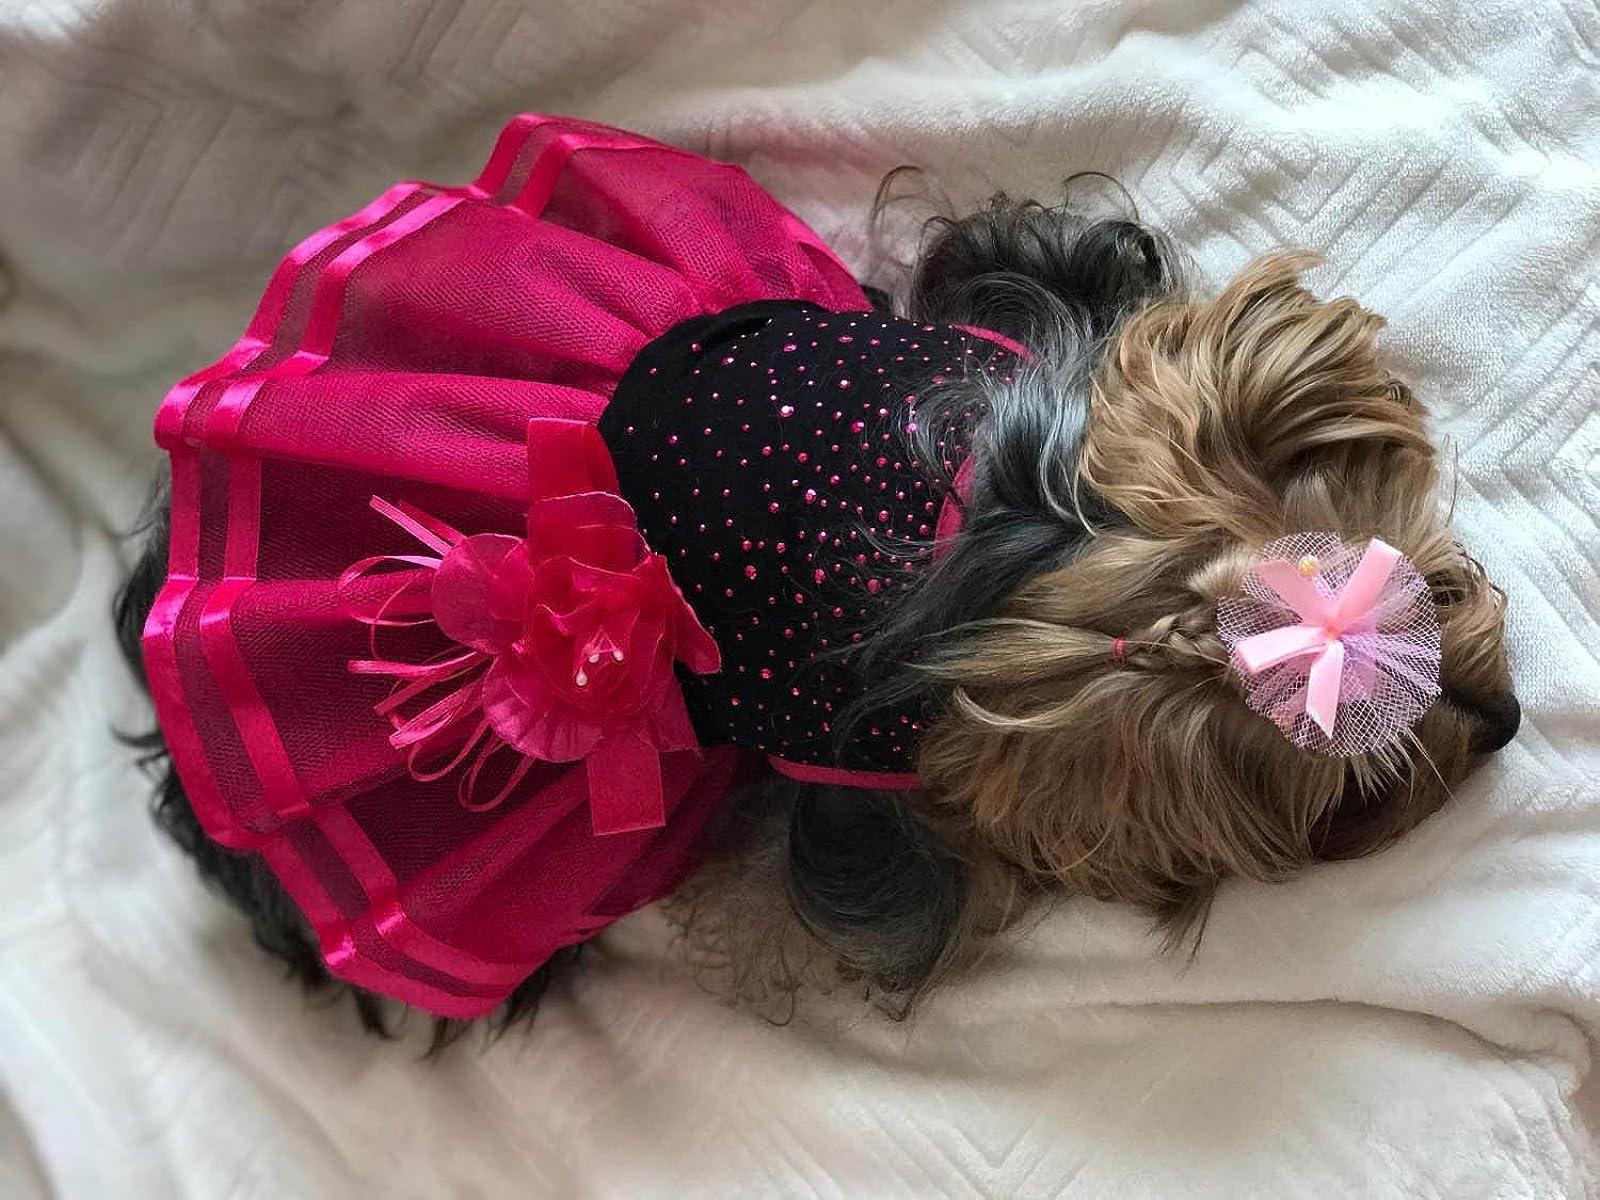 Topsung Small Dog Clothes Dress Blingbling Tutu - 6